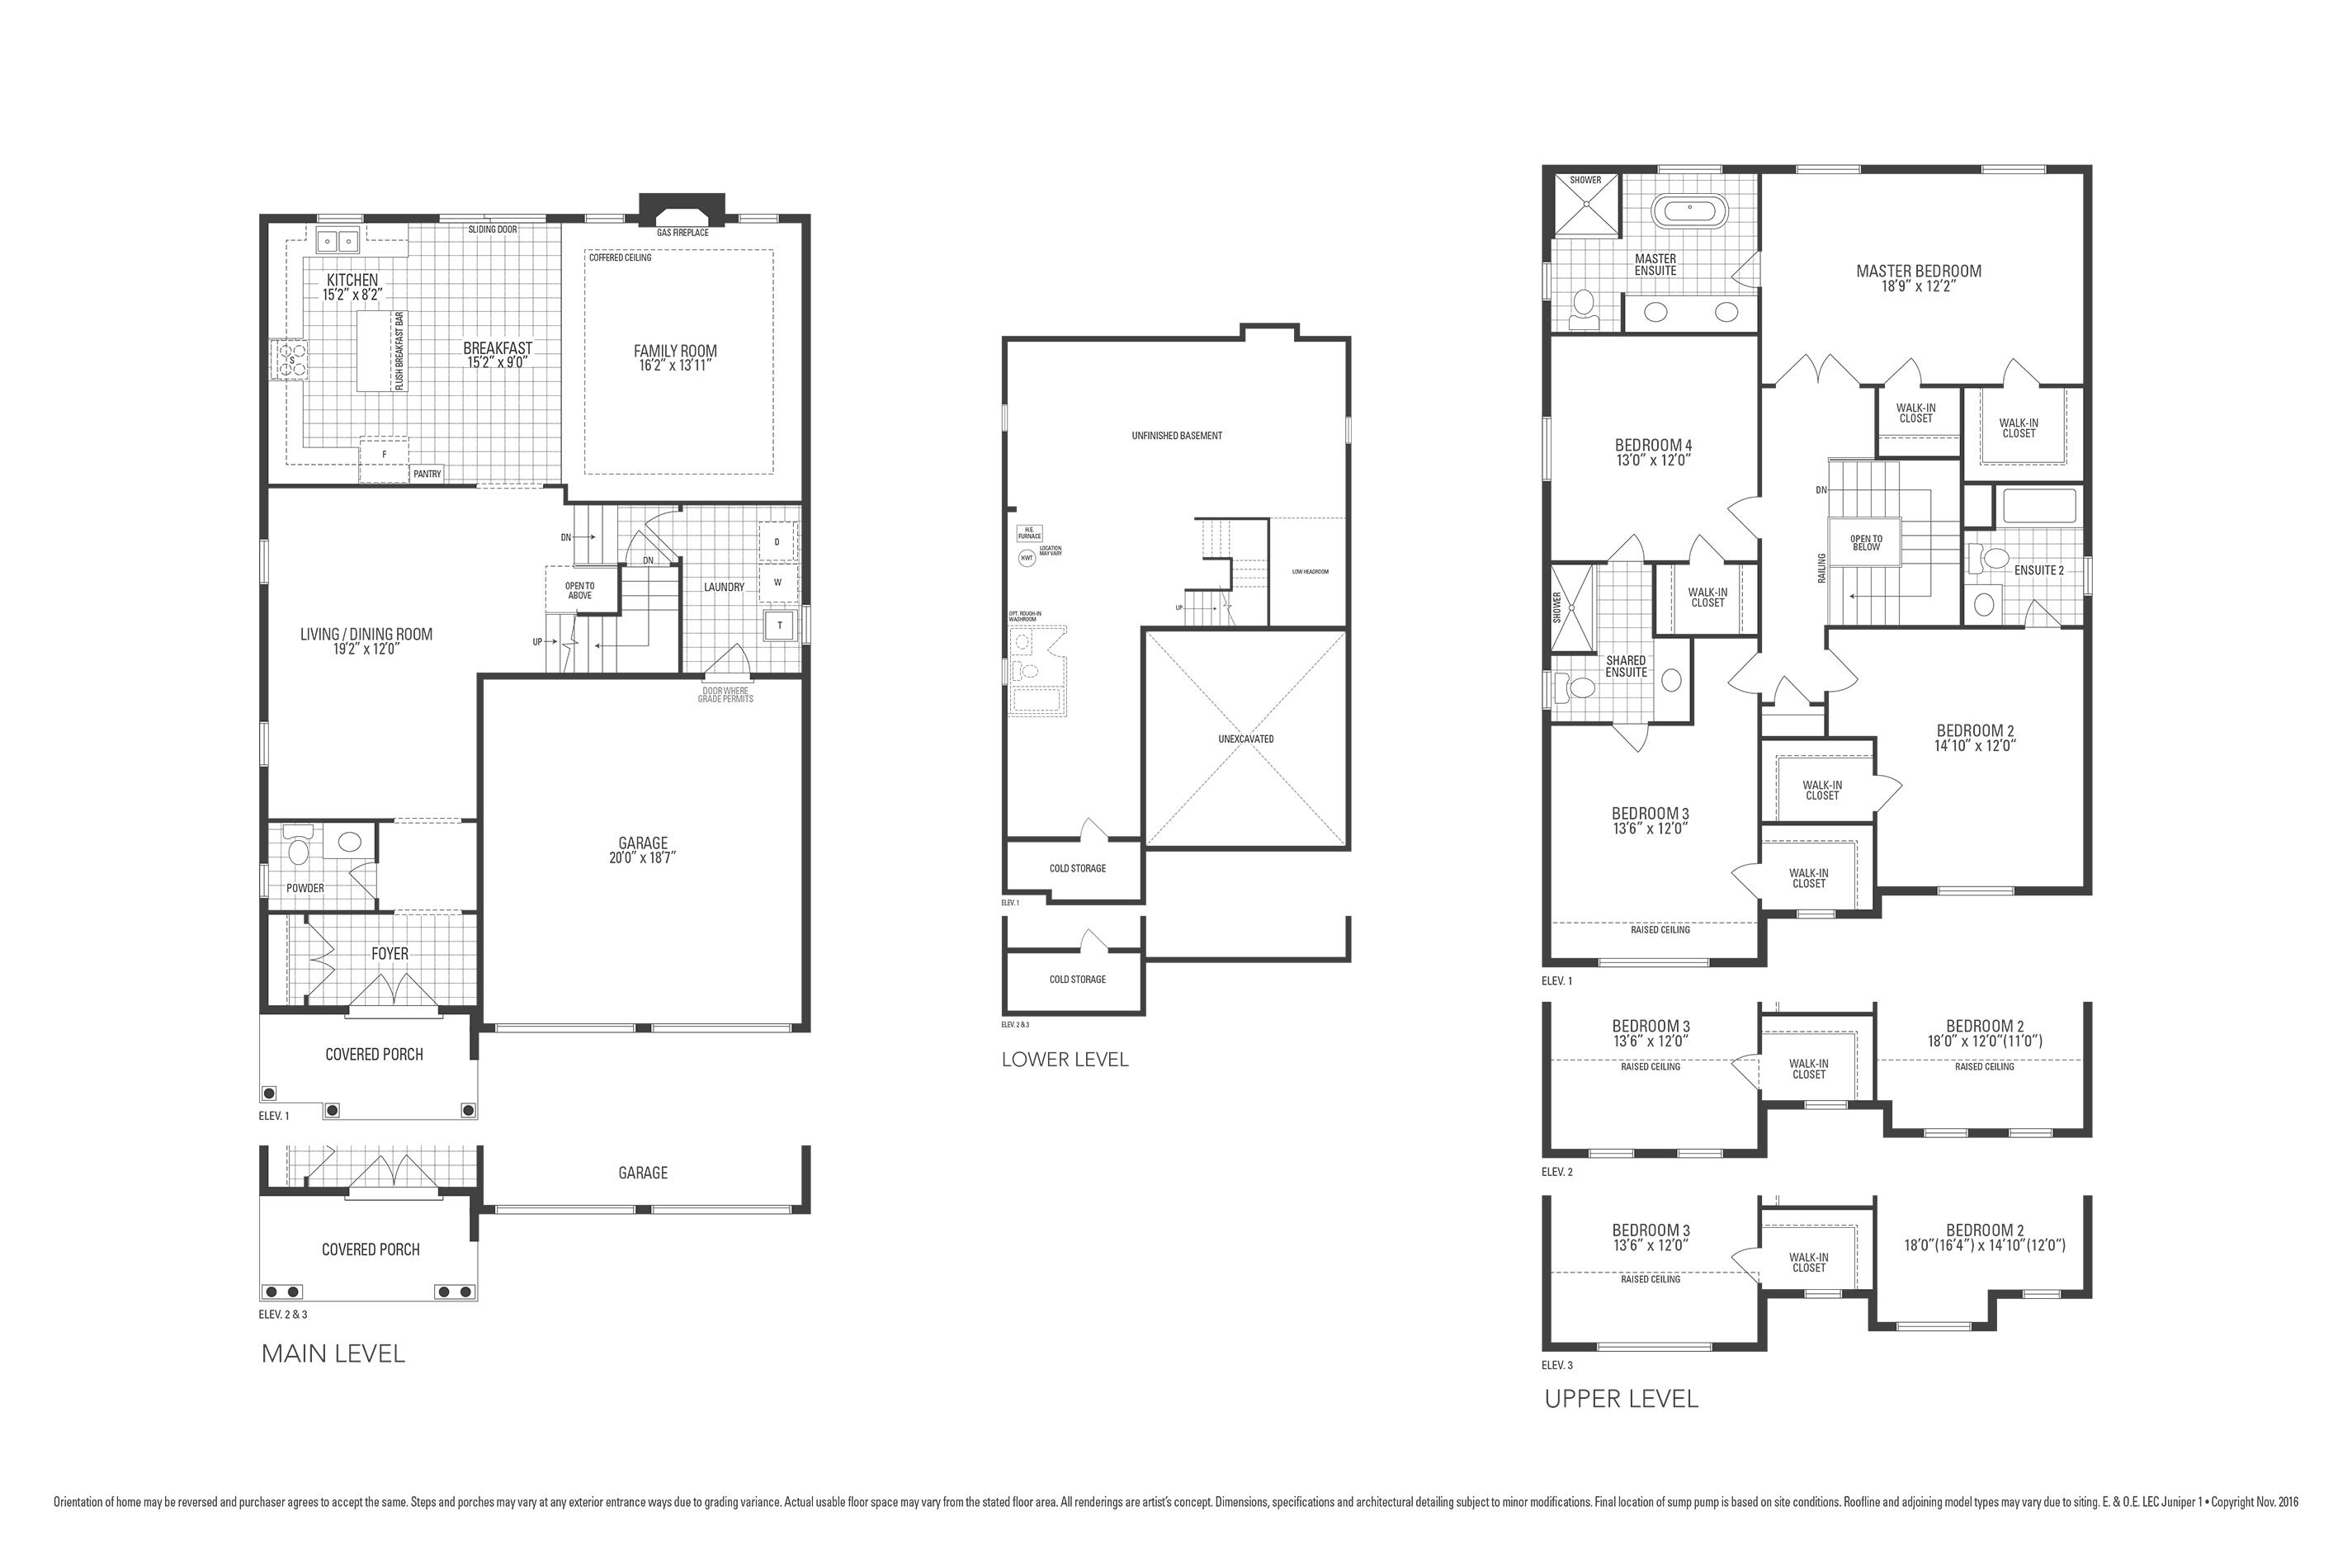 Rosewood 1 Floorplan